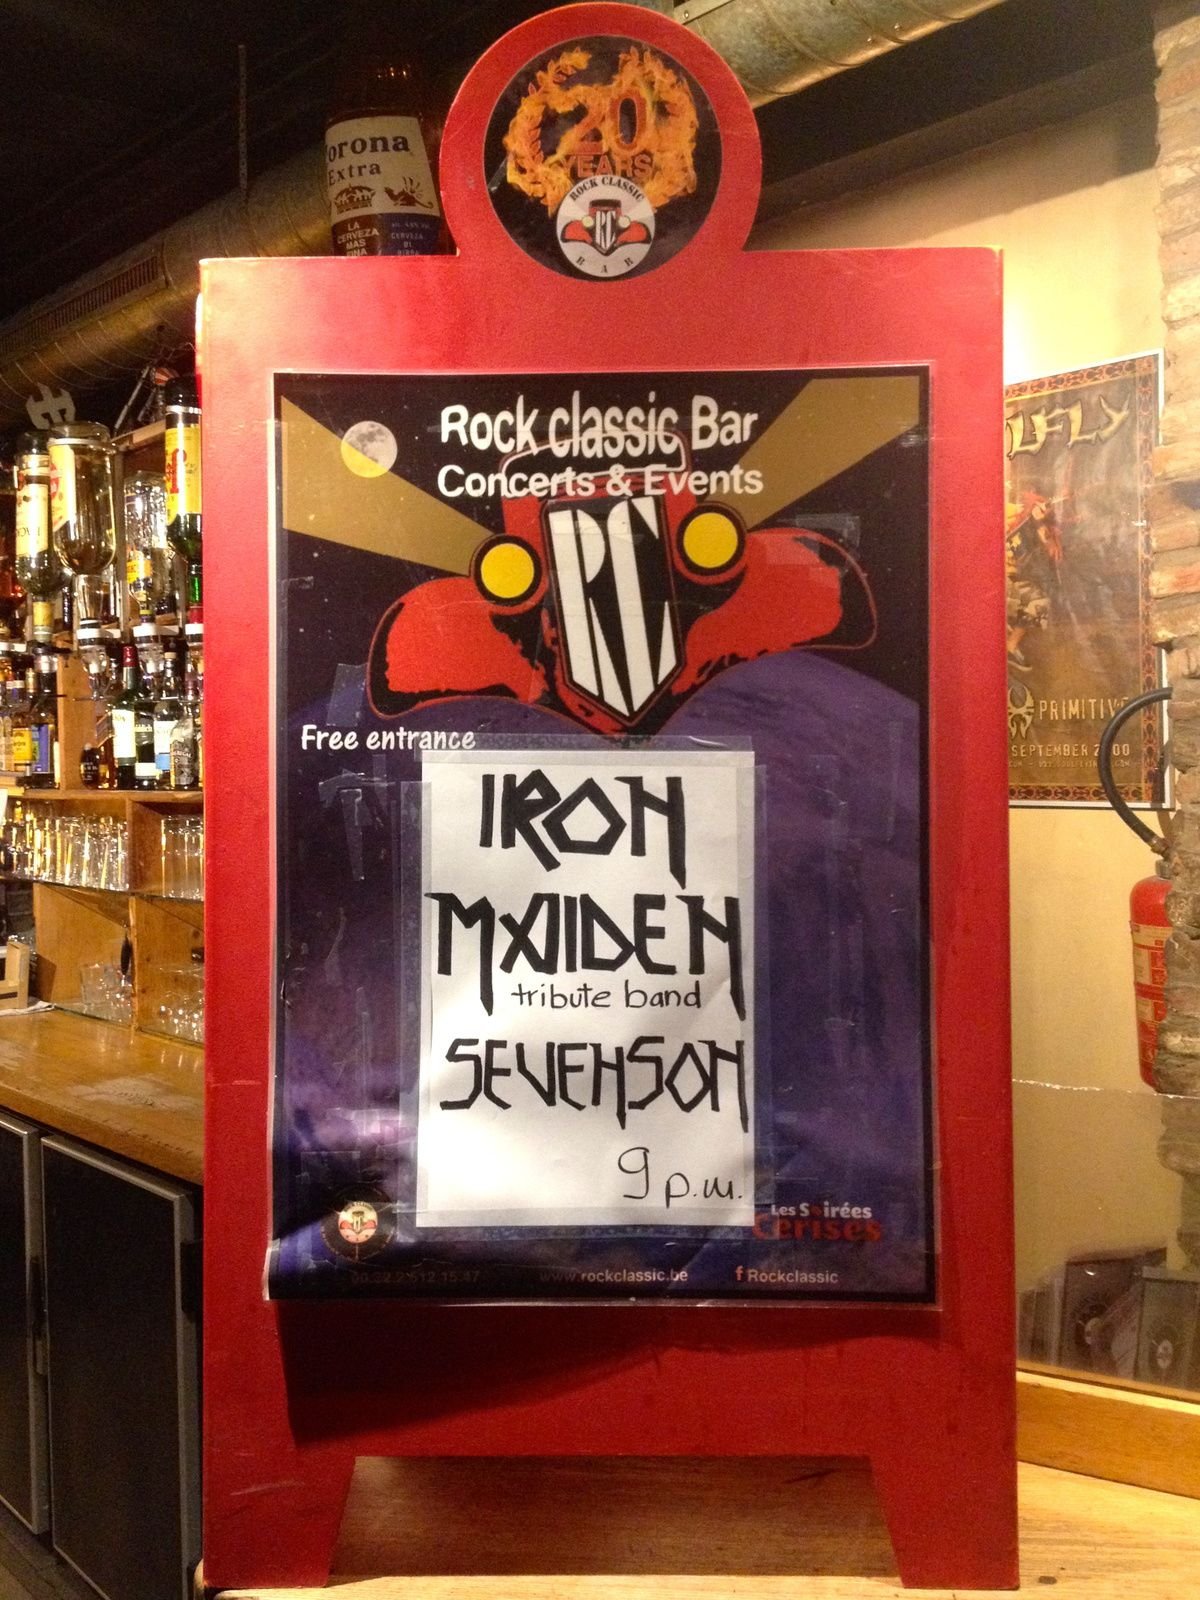 ▶ Sevenson (IRON MAIDEN tribute band) @ Rock Classic - 26/05/2017